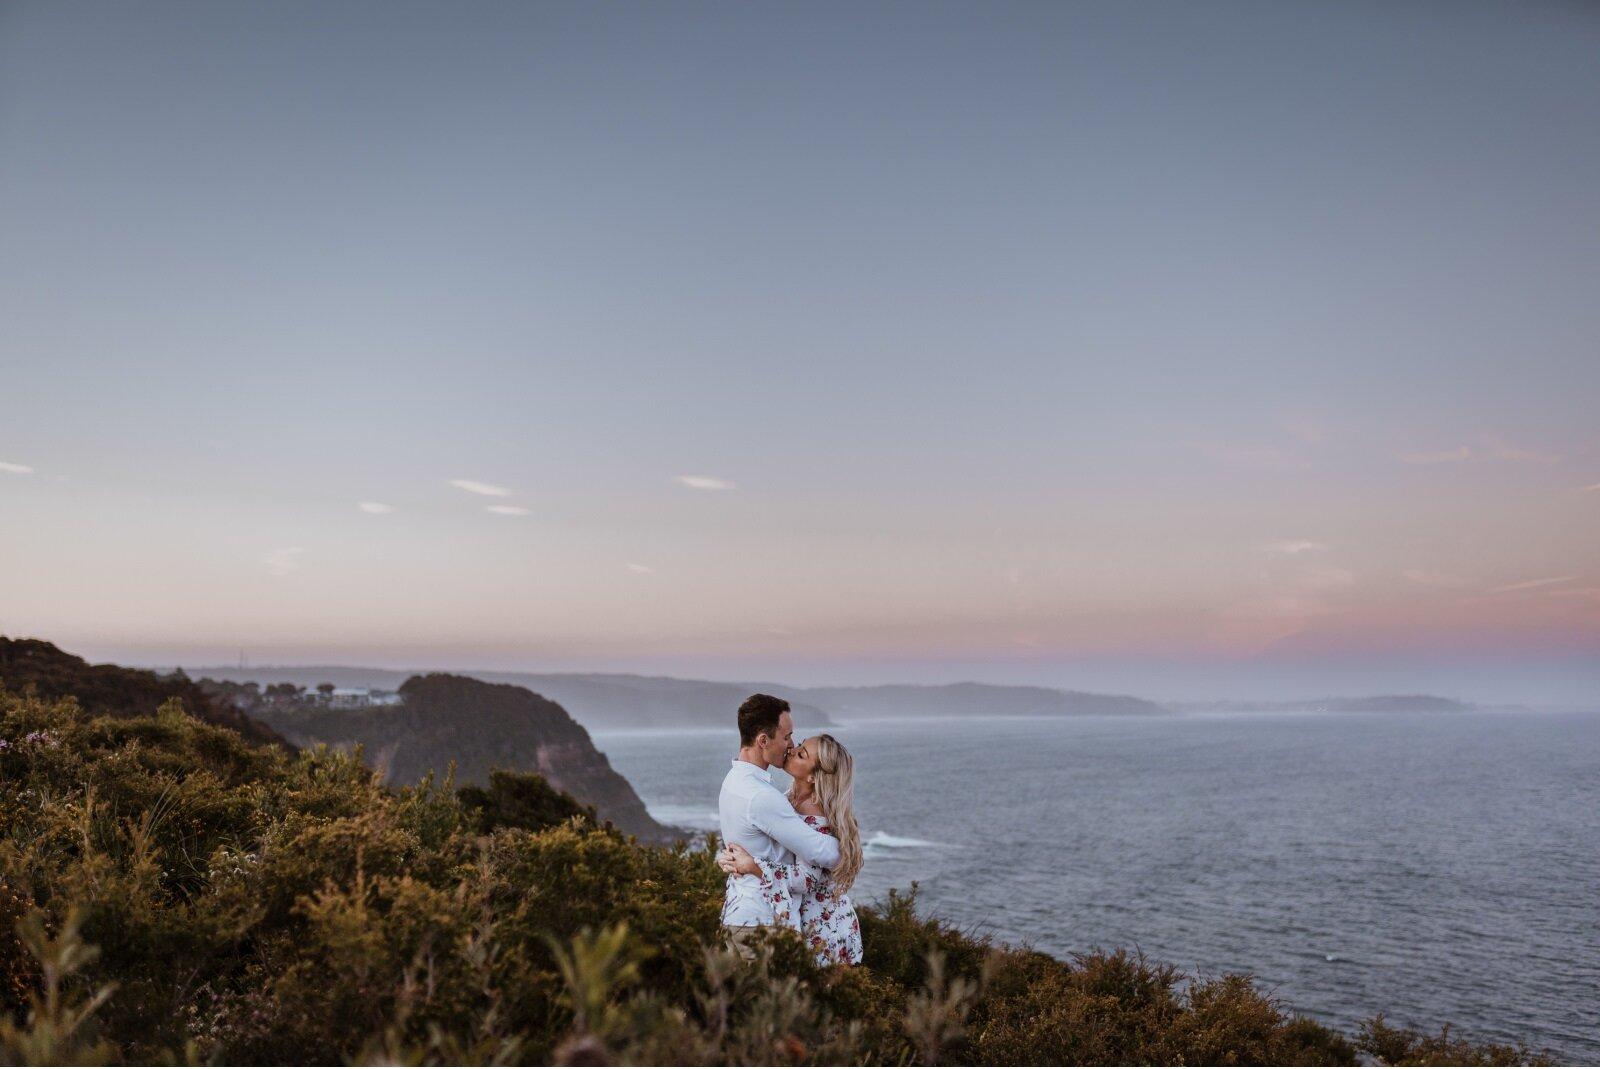 newcastle-wedding-photographer-dudley-engagement-shoot-24.jpg